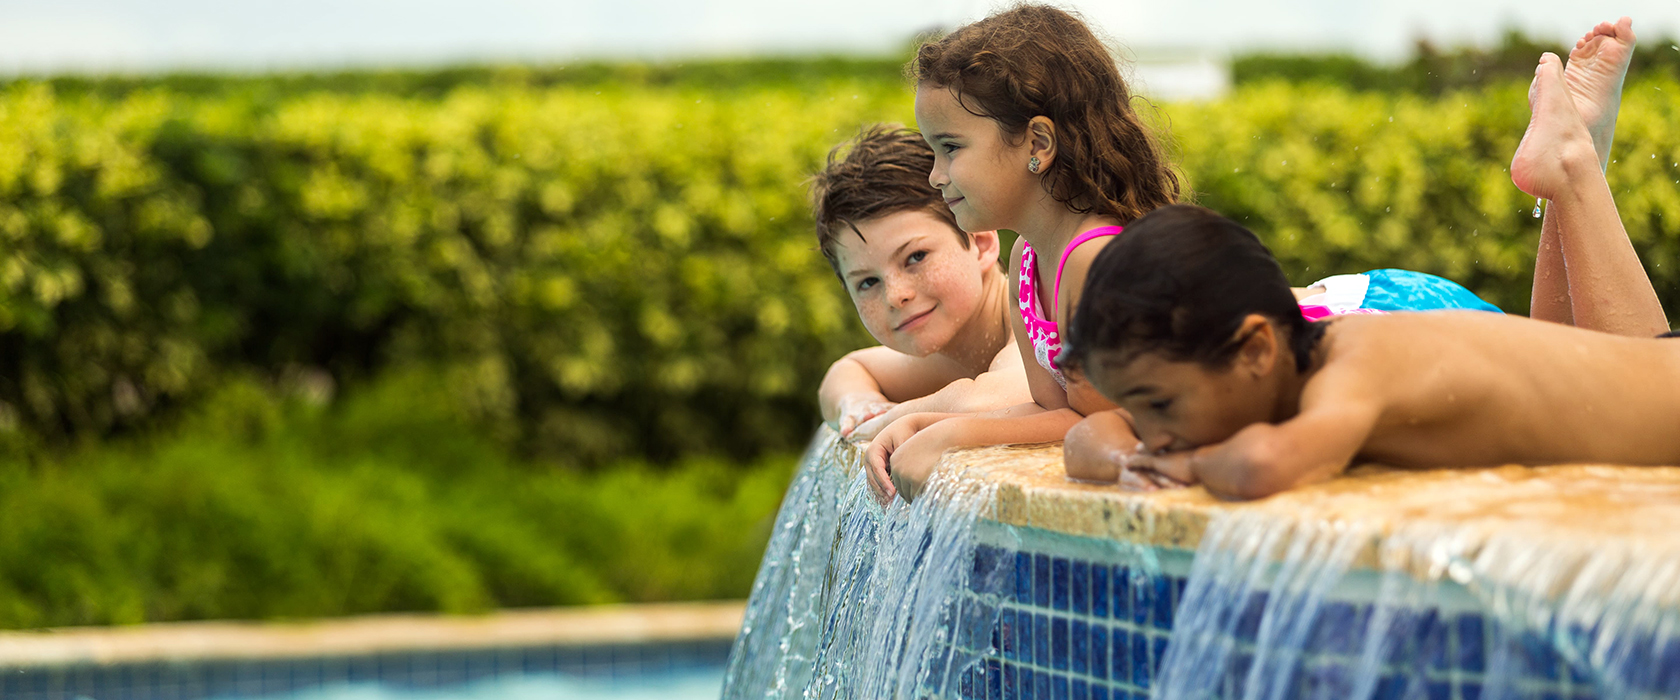 Family Fun at Caribe Hilton